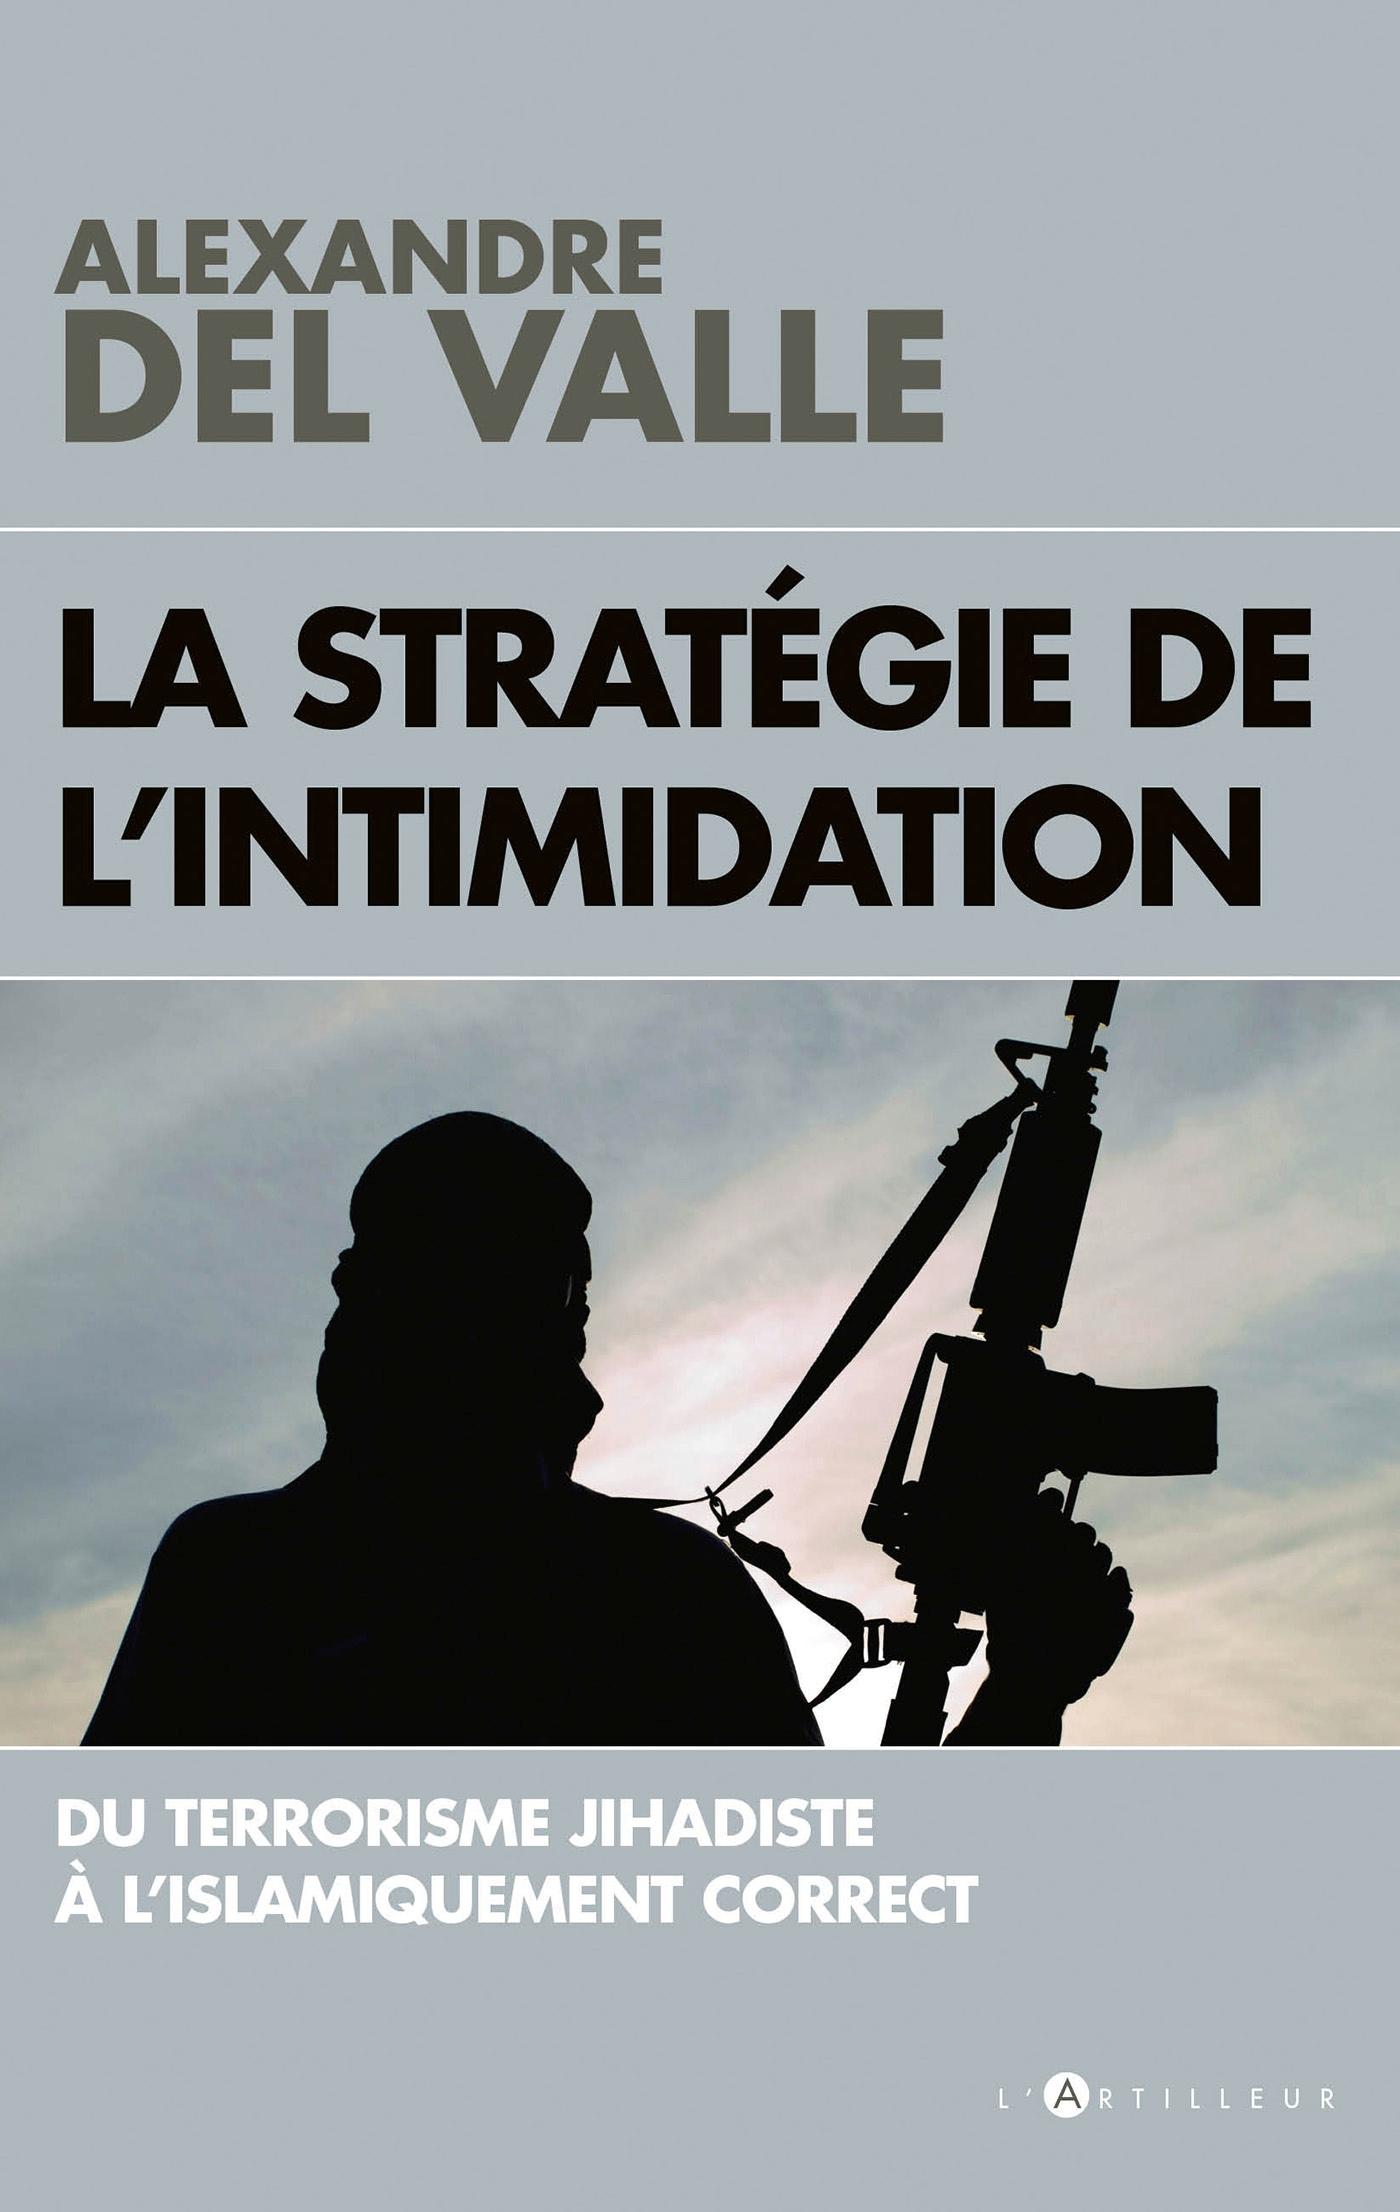 LA STRATEGIE DE L'INTIMIDATION